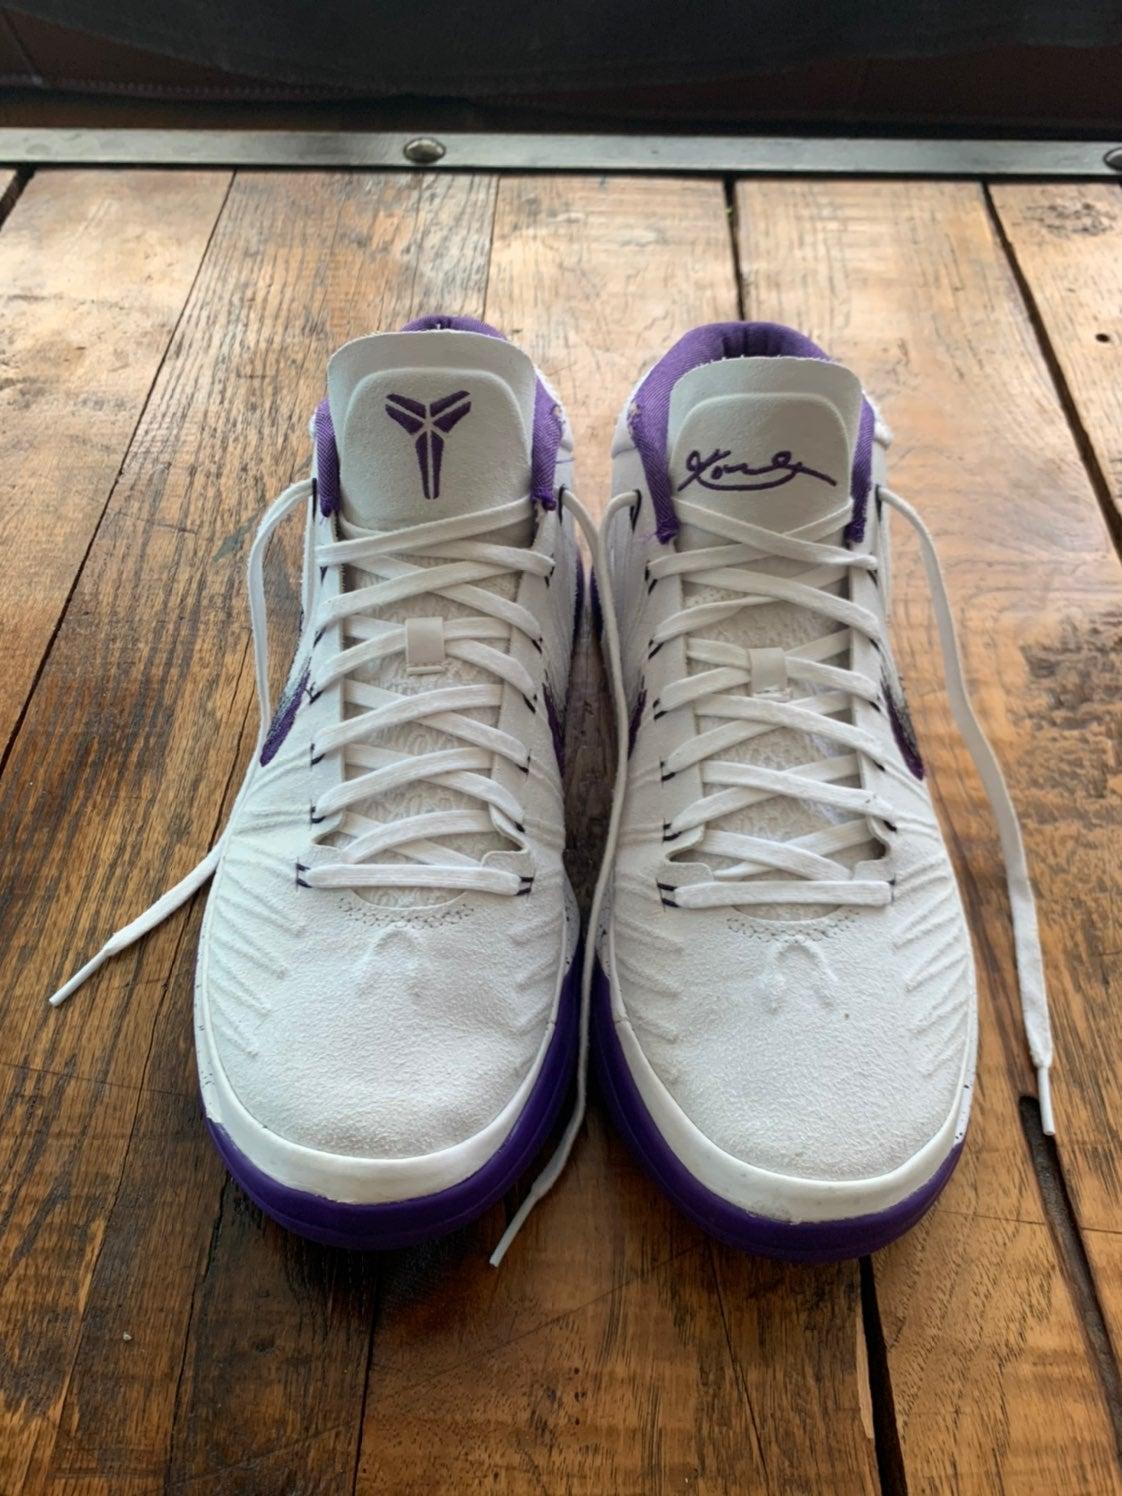 Nike kobe bryant athletic shoes for men